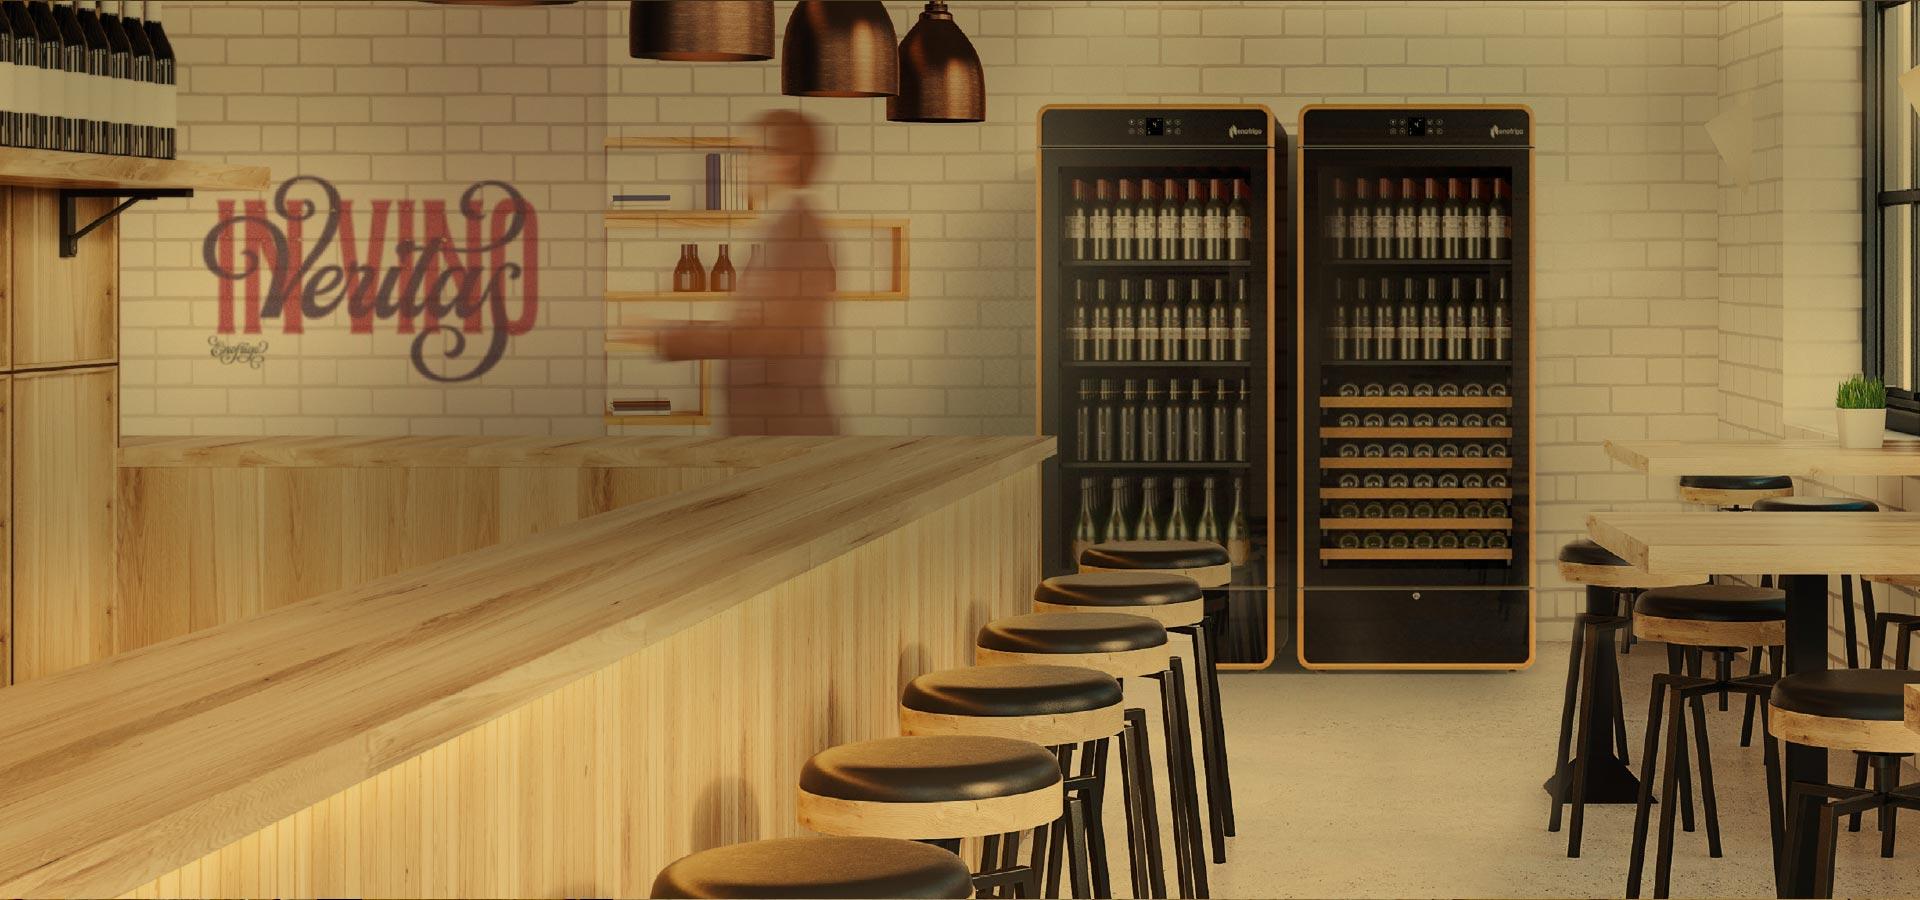 i-am-wine-display-cabinets